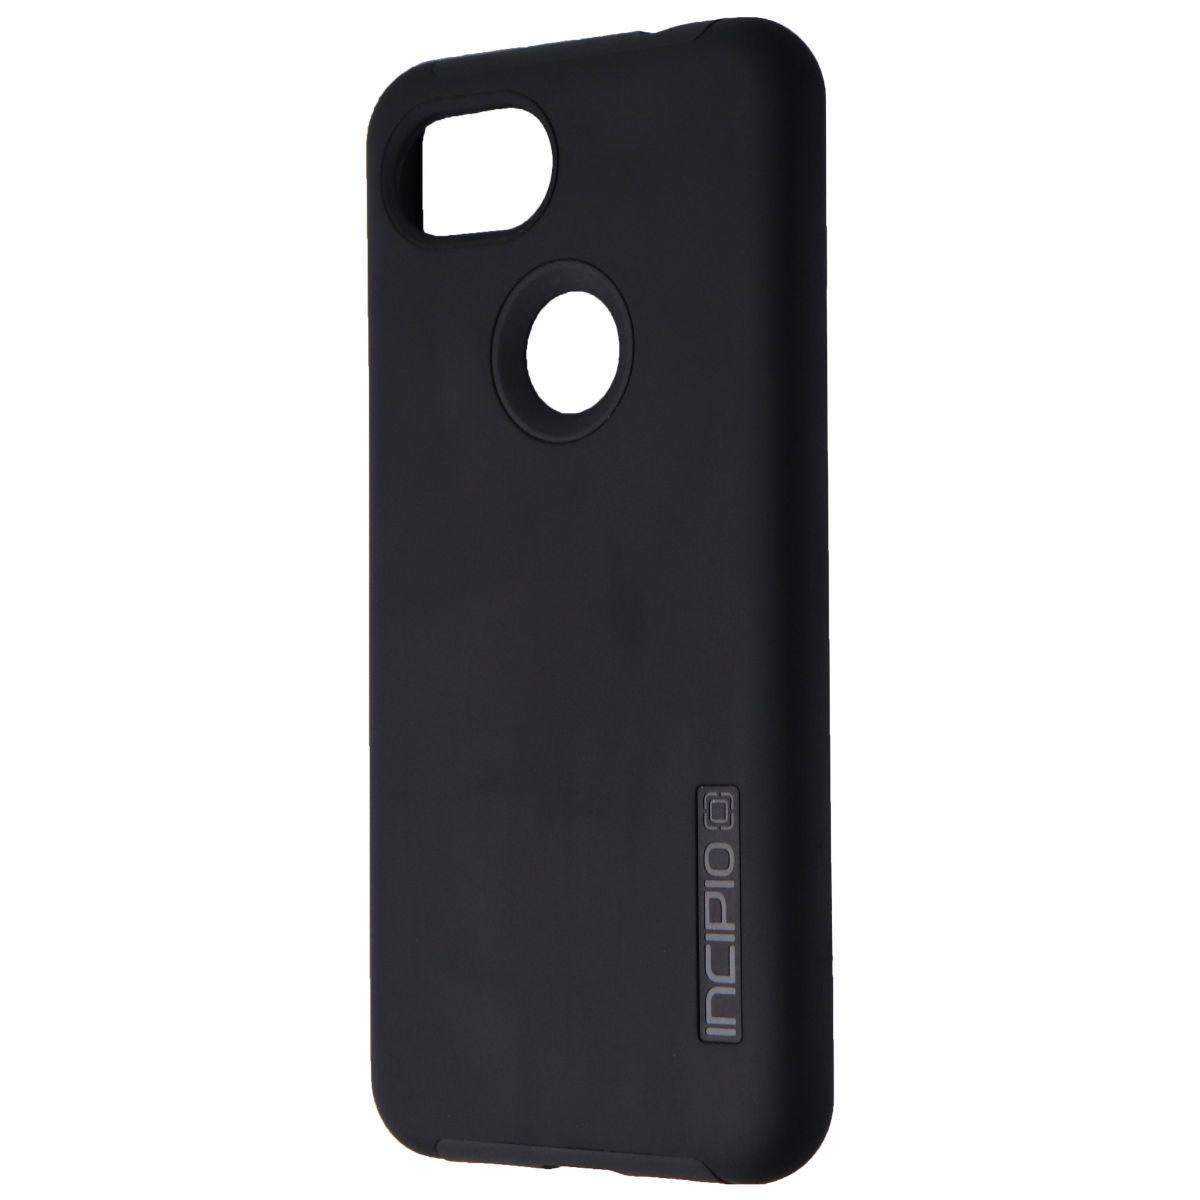 Incipio DualPro Series Case for Google Pixel 3a XL - Matte Black